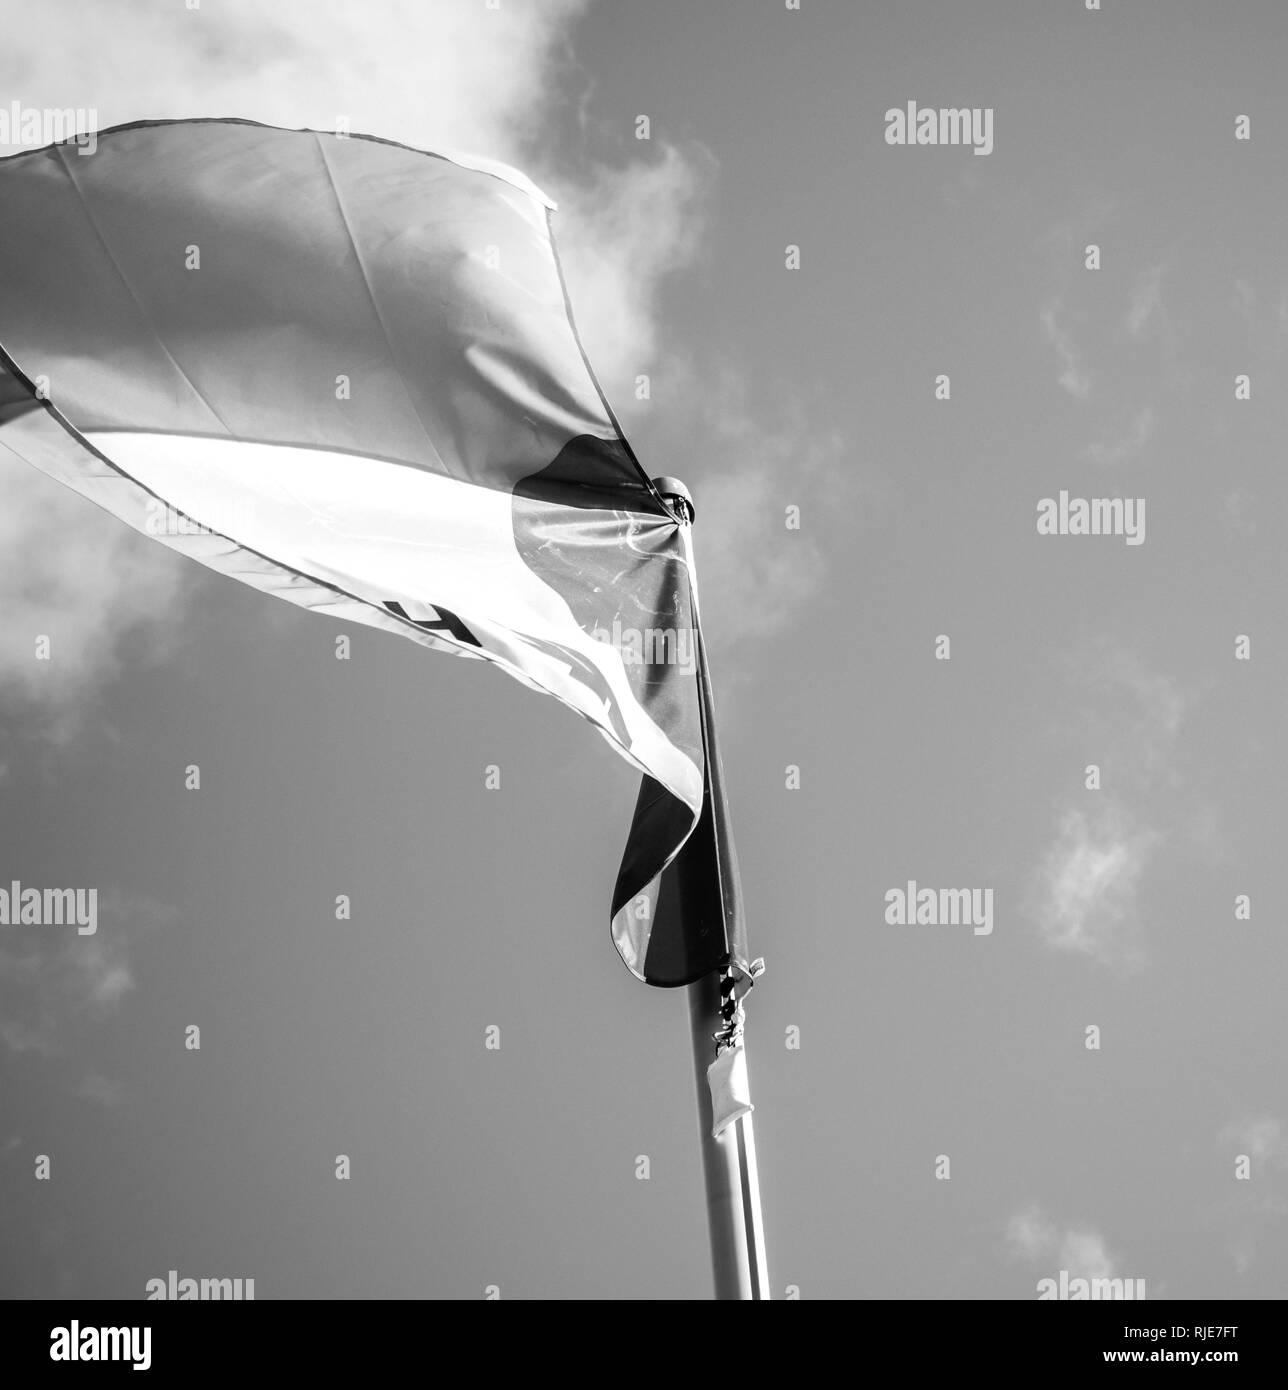 HAMBURG, GERMANY - MAR 20, 2018: Hapag-Lloyd transnational German-based transportation company flag waving against blue sky - black and white - Stock Image